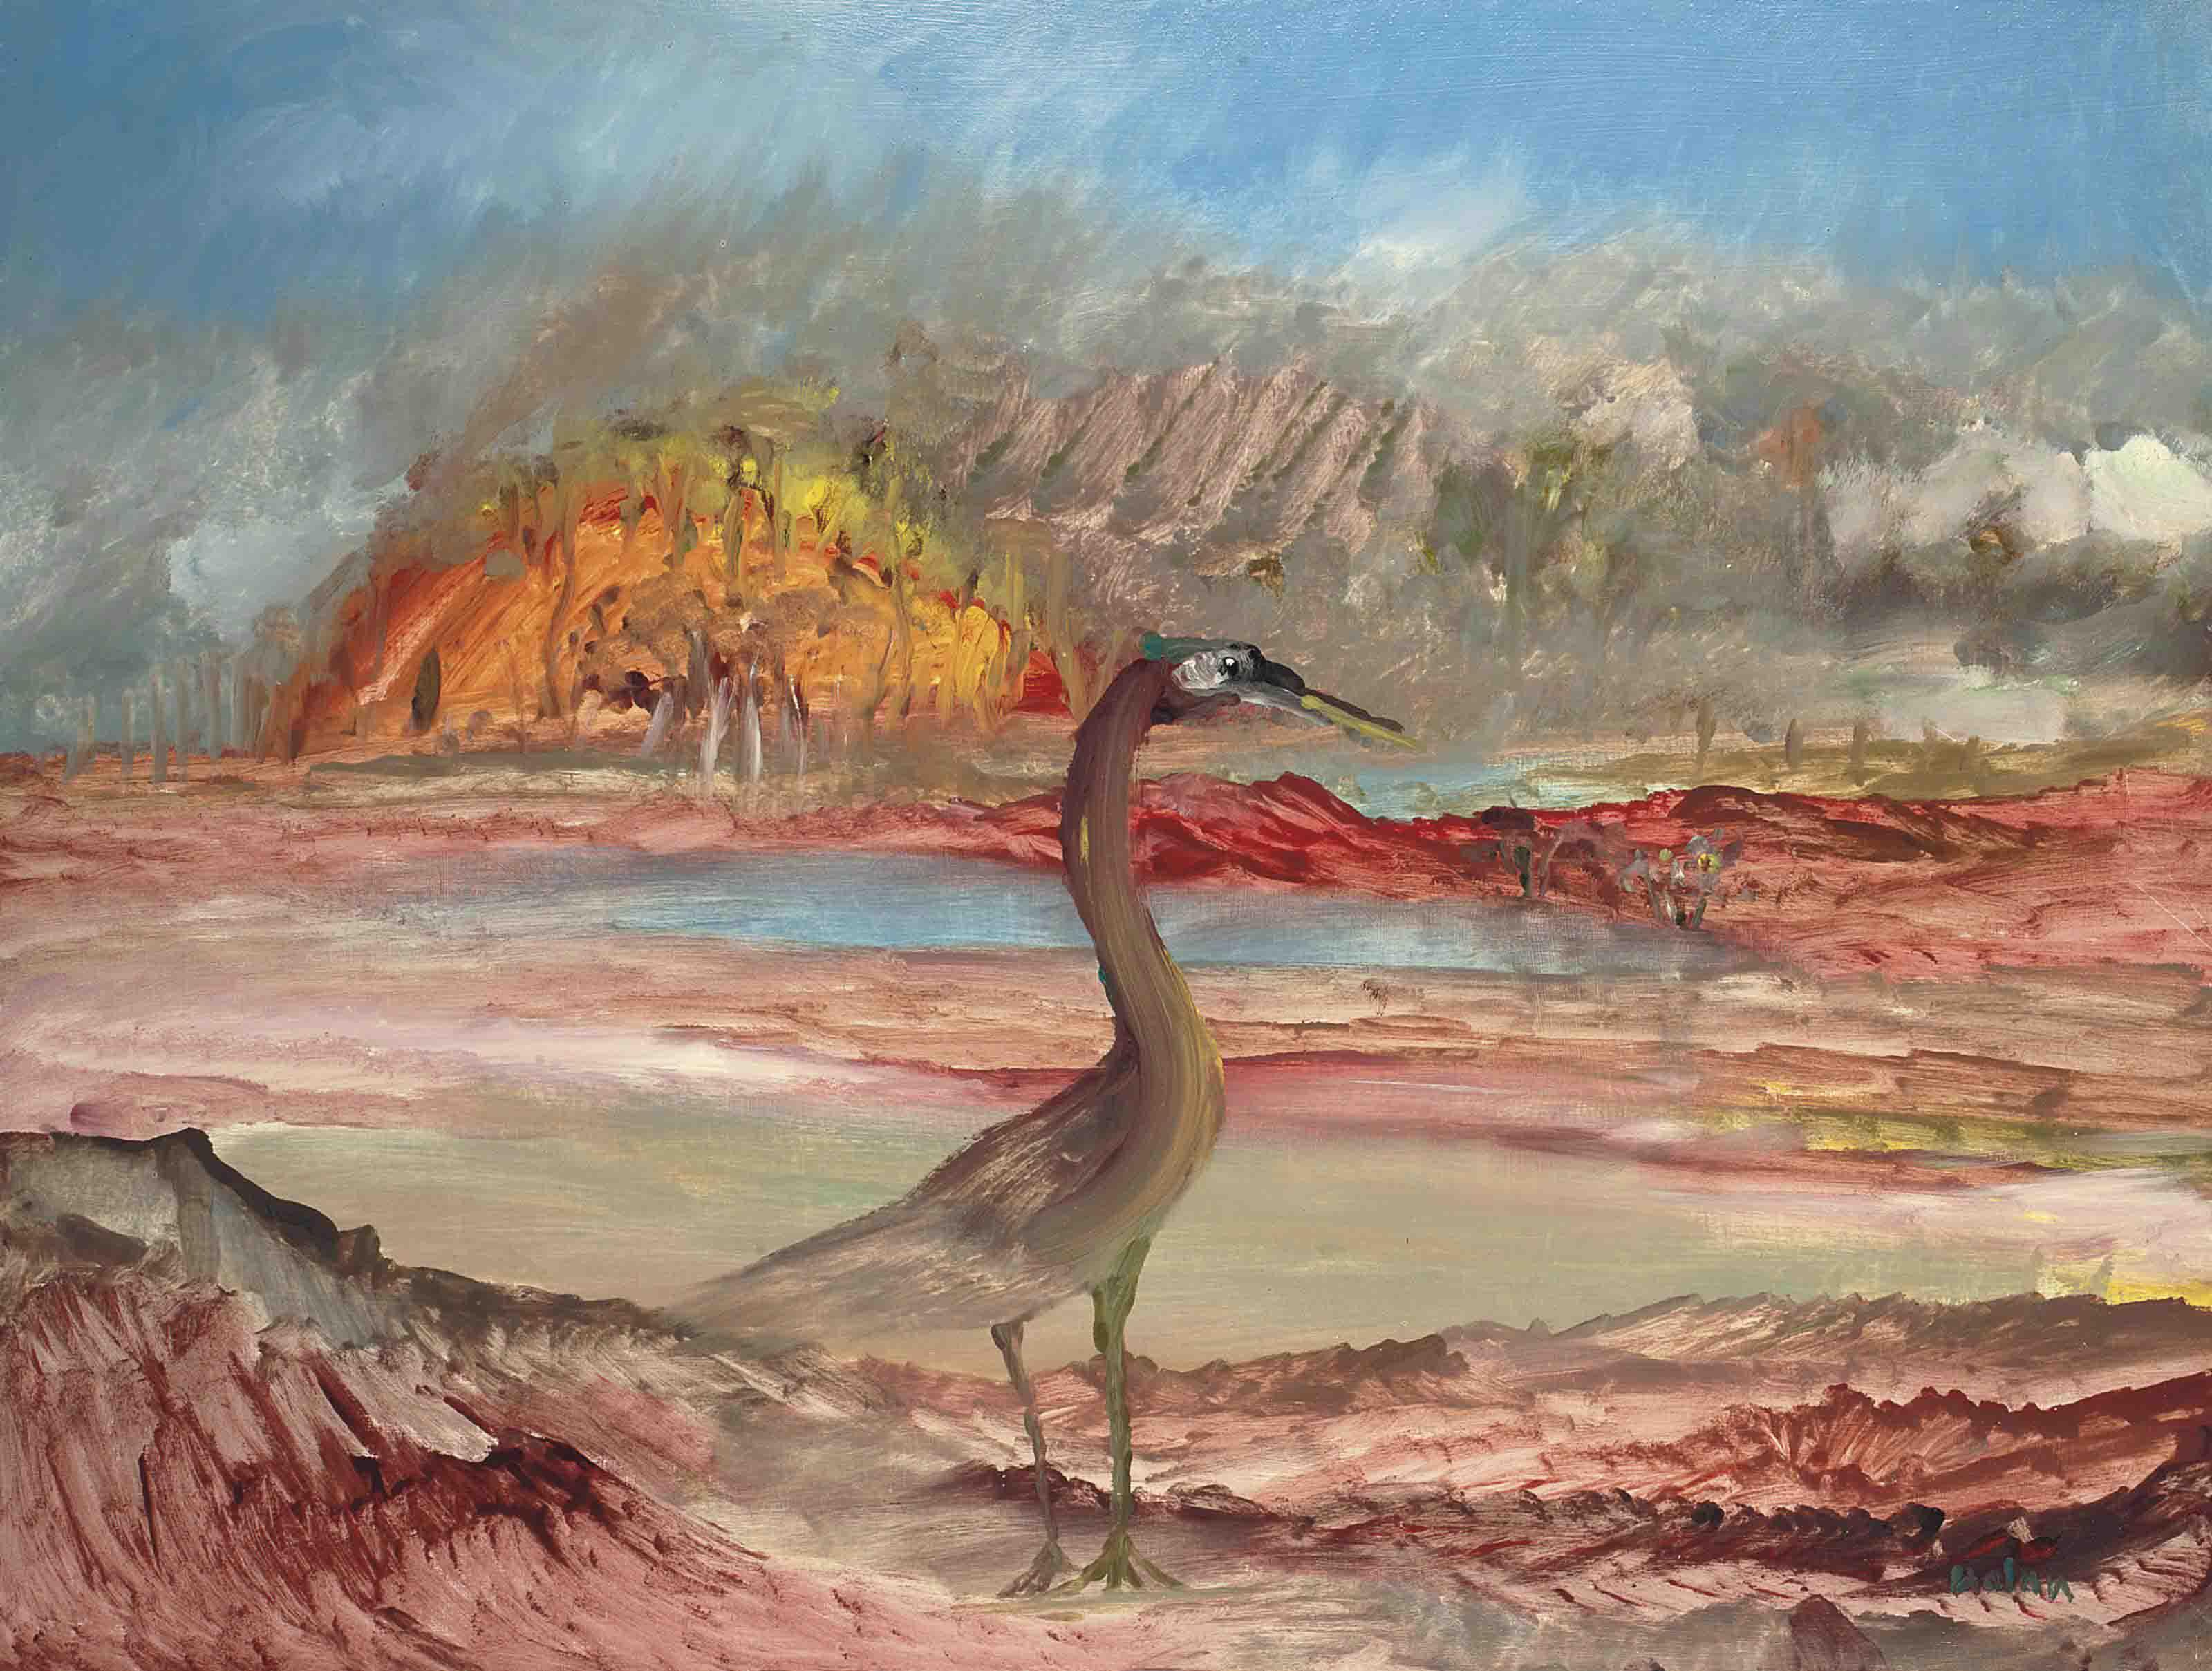 Bird in landscape